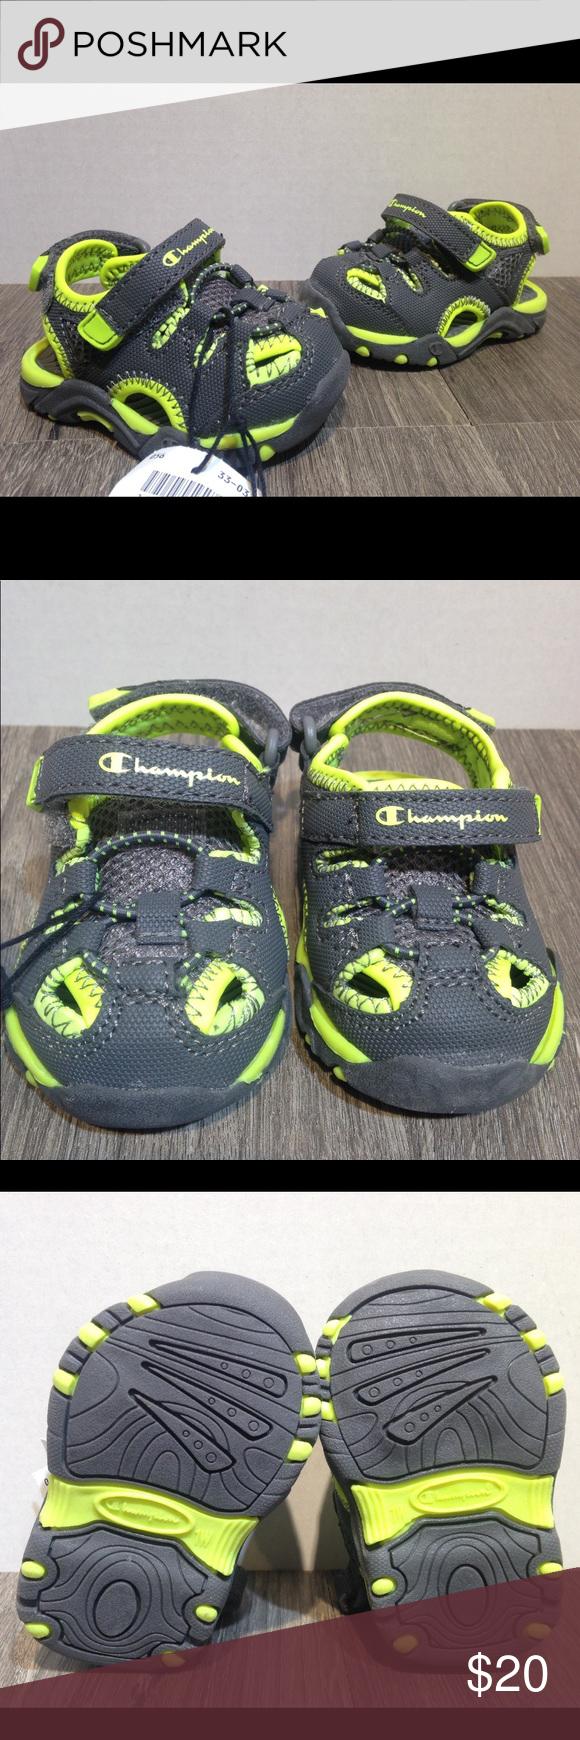 215e93239 Infant fisherman sandals size 1